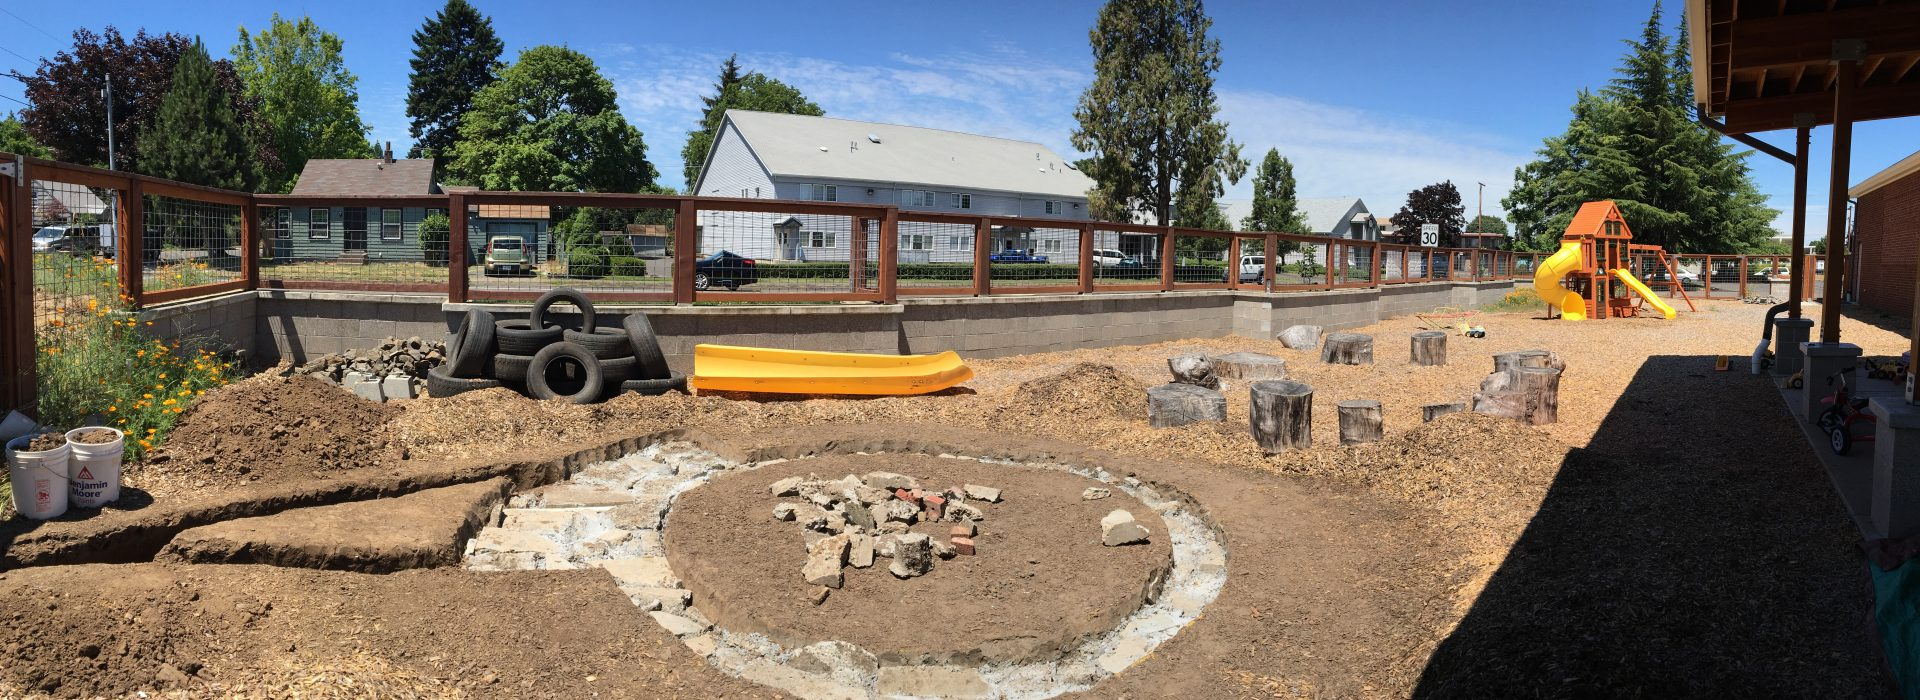 playgroundwide2